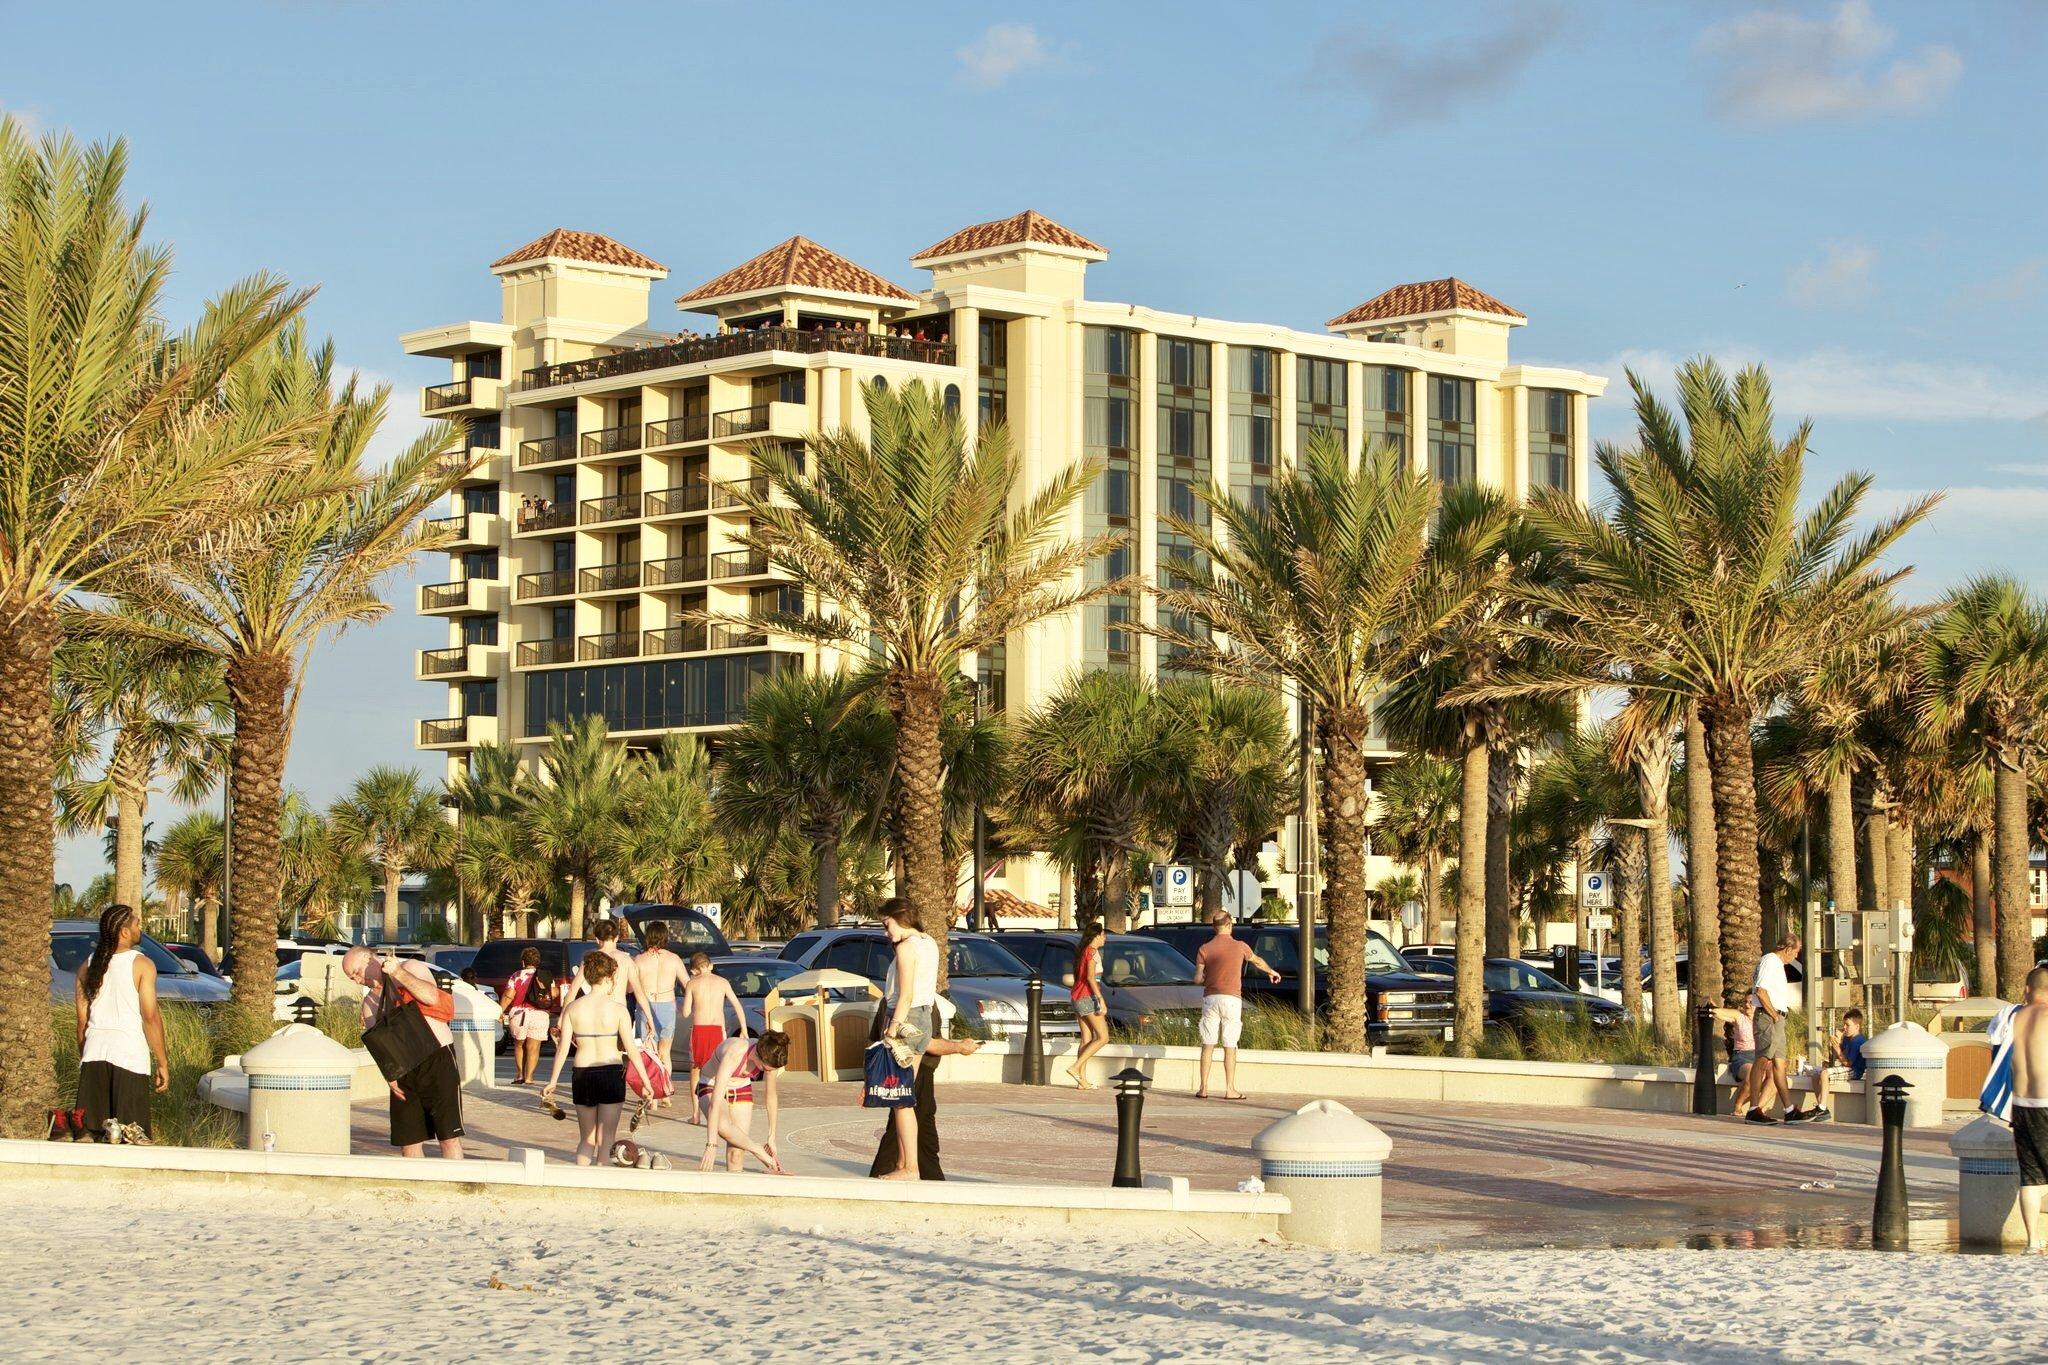 hotel in clearwater florida pier house 60 marina hotel rh pierhouse60 com